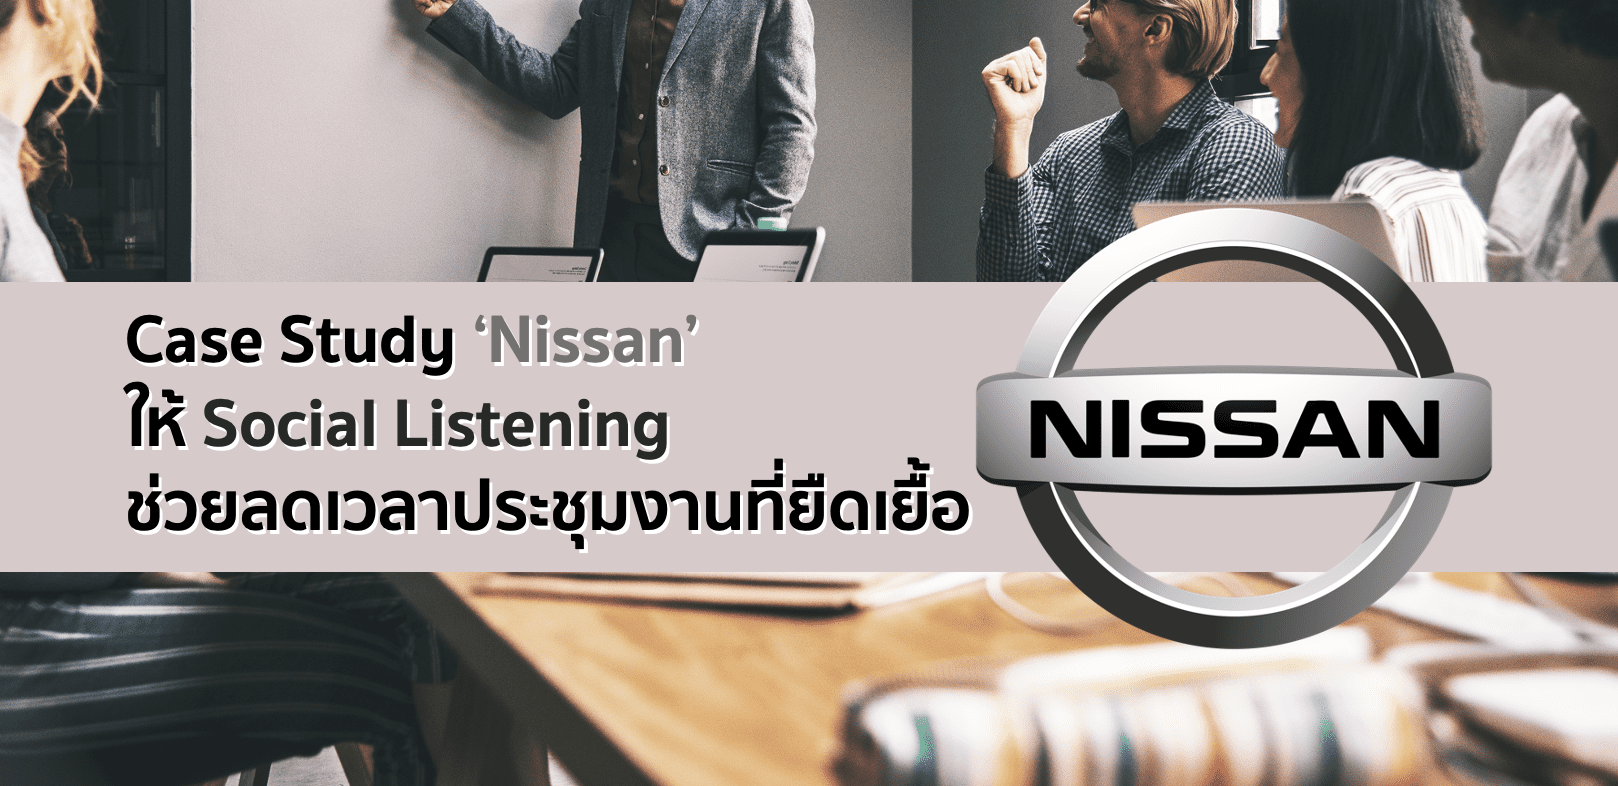 Case Study 'Nissan' – ให้ Social Listening Tools ช่วยลดเวลาประชุมงานที่ยืดเยื้อ